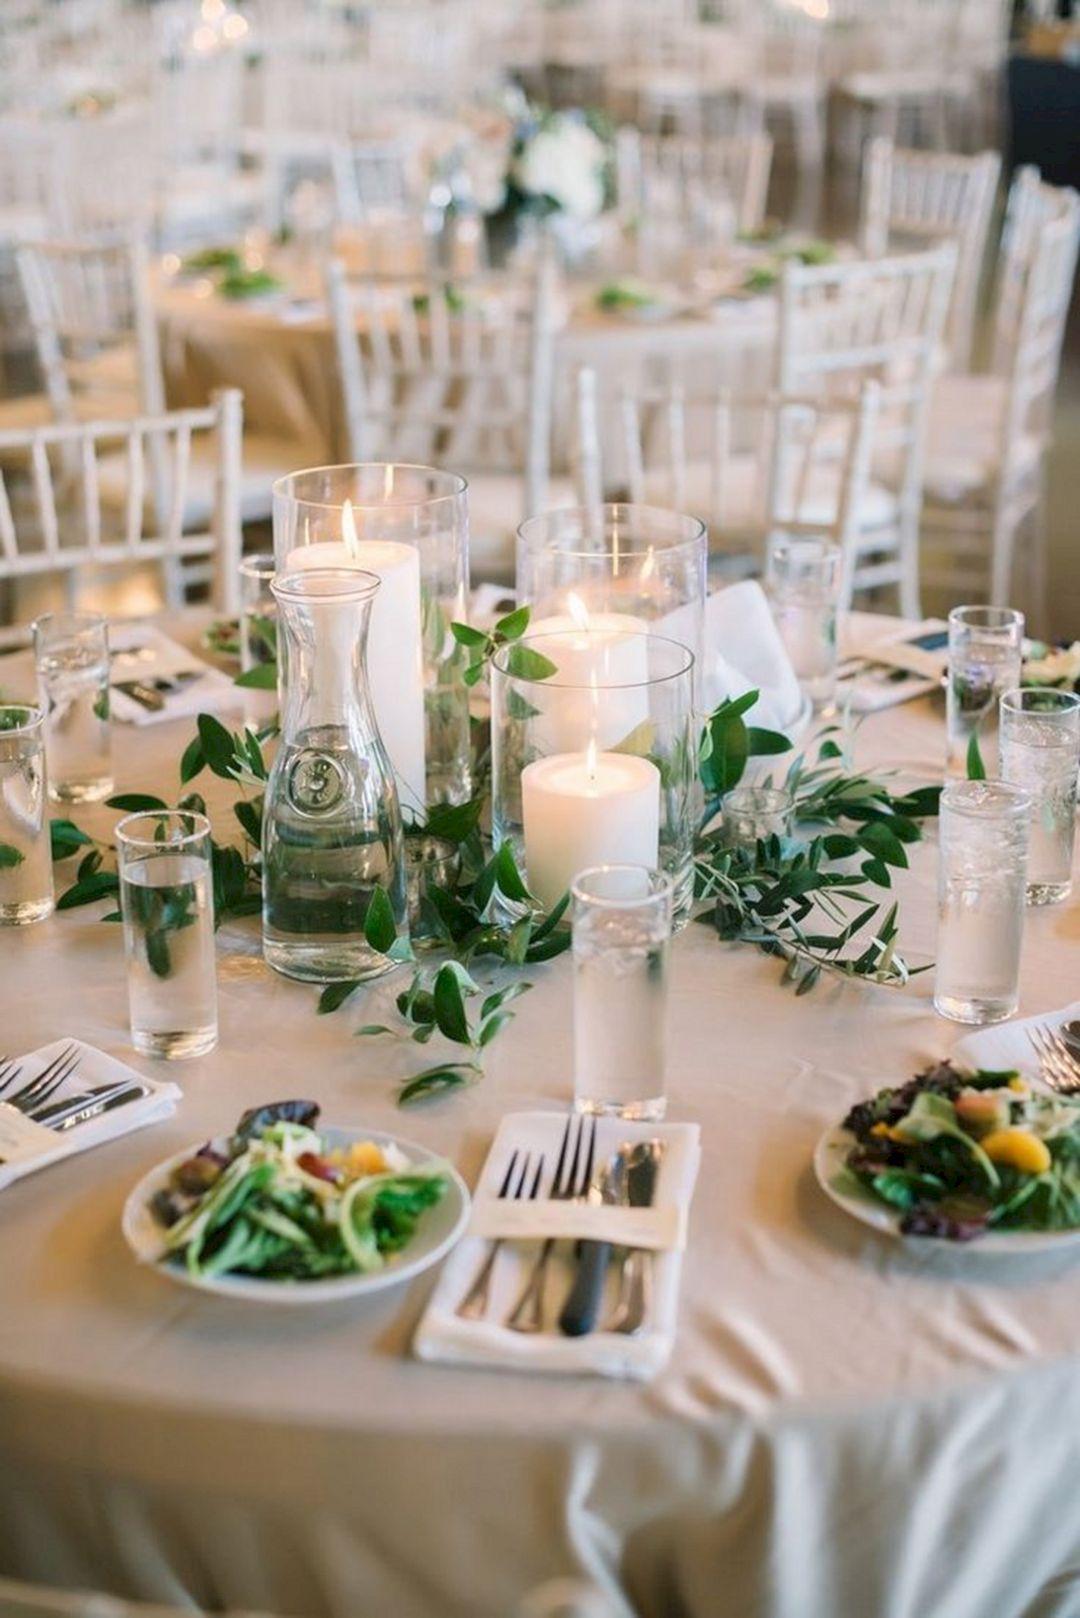 20 Gorgeous Greenery Wedding Decoration Ideas On A Budget Greenery Wedding Centerpieces Greenery Wedding Decor Cheap Wedding Table Centerpieces